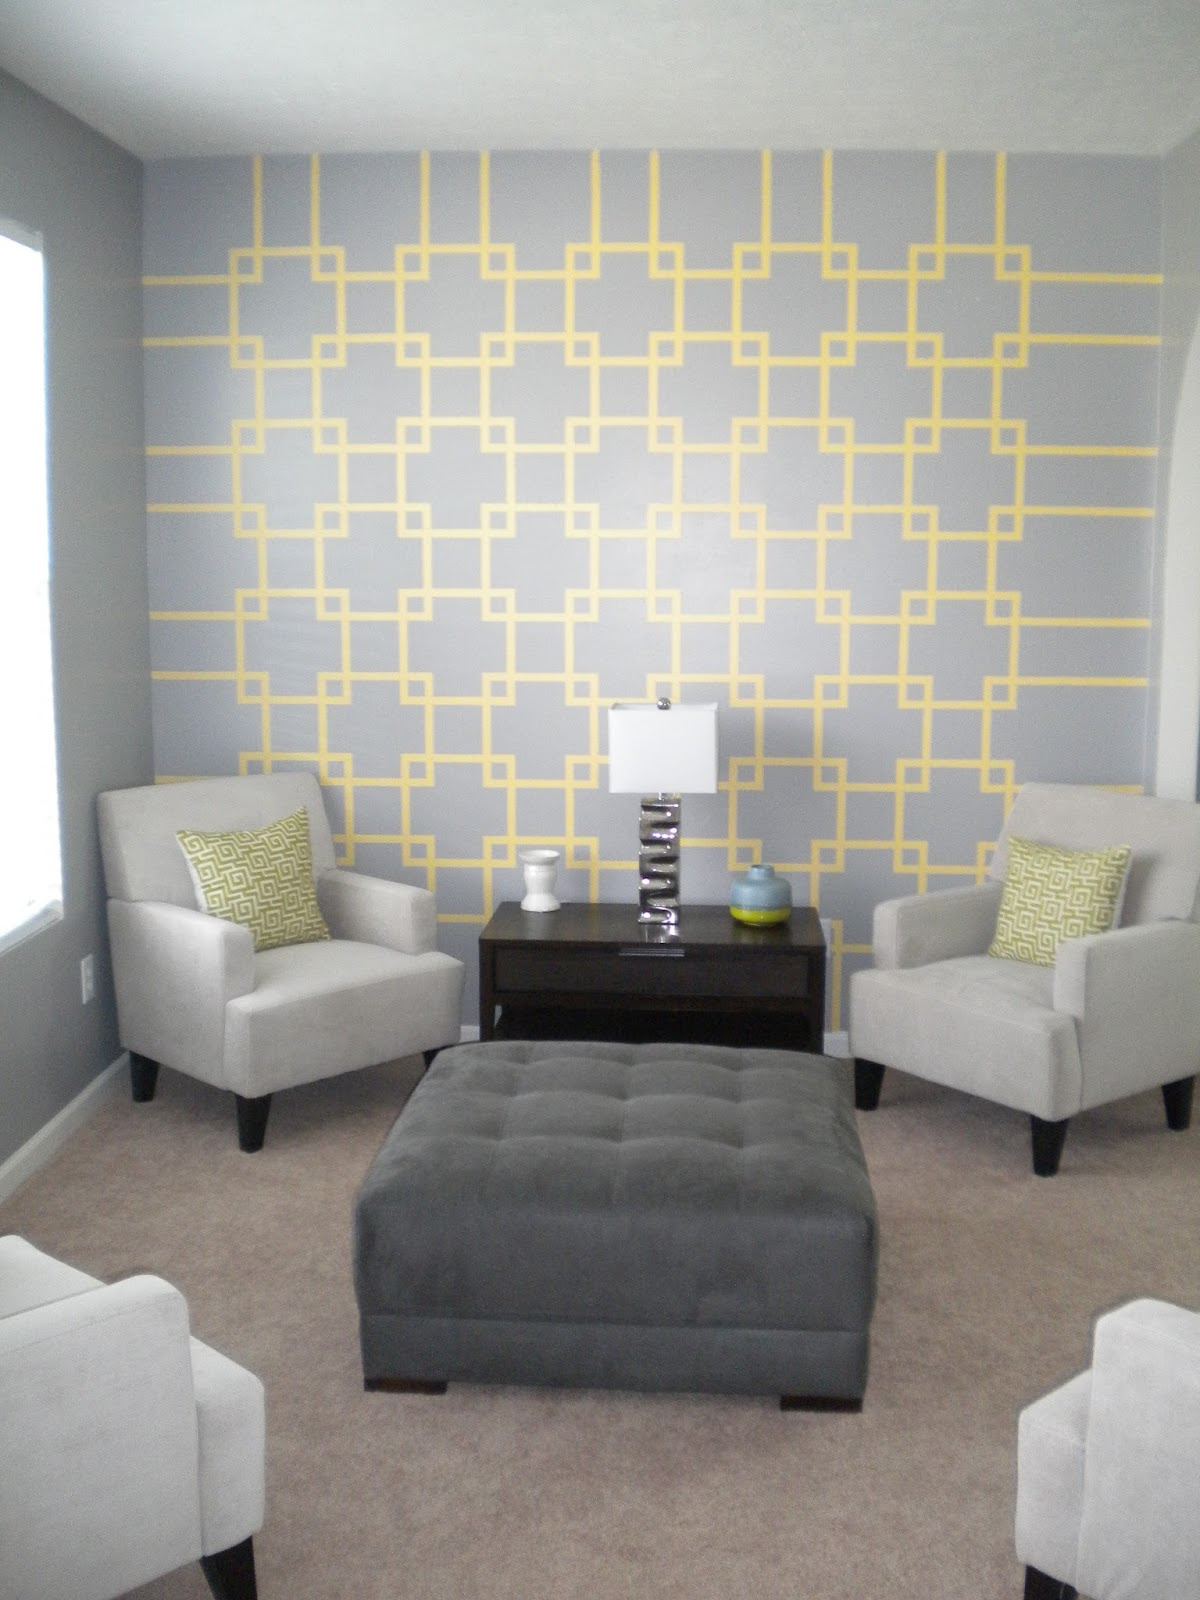 Room Paint Designer: Image Source